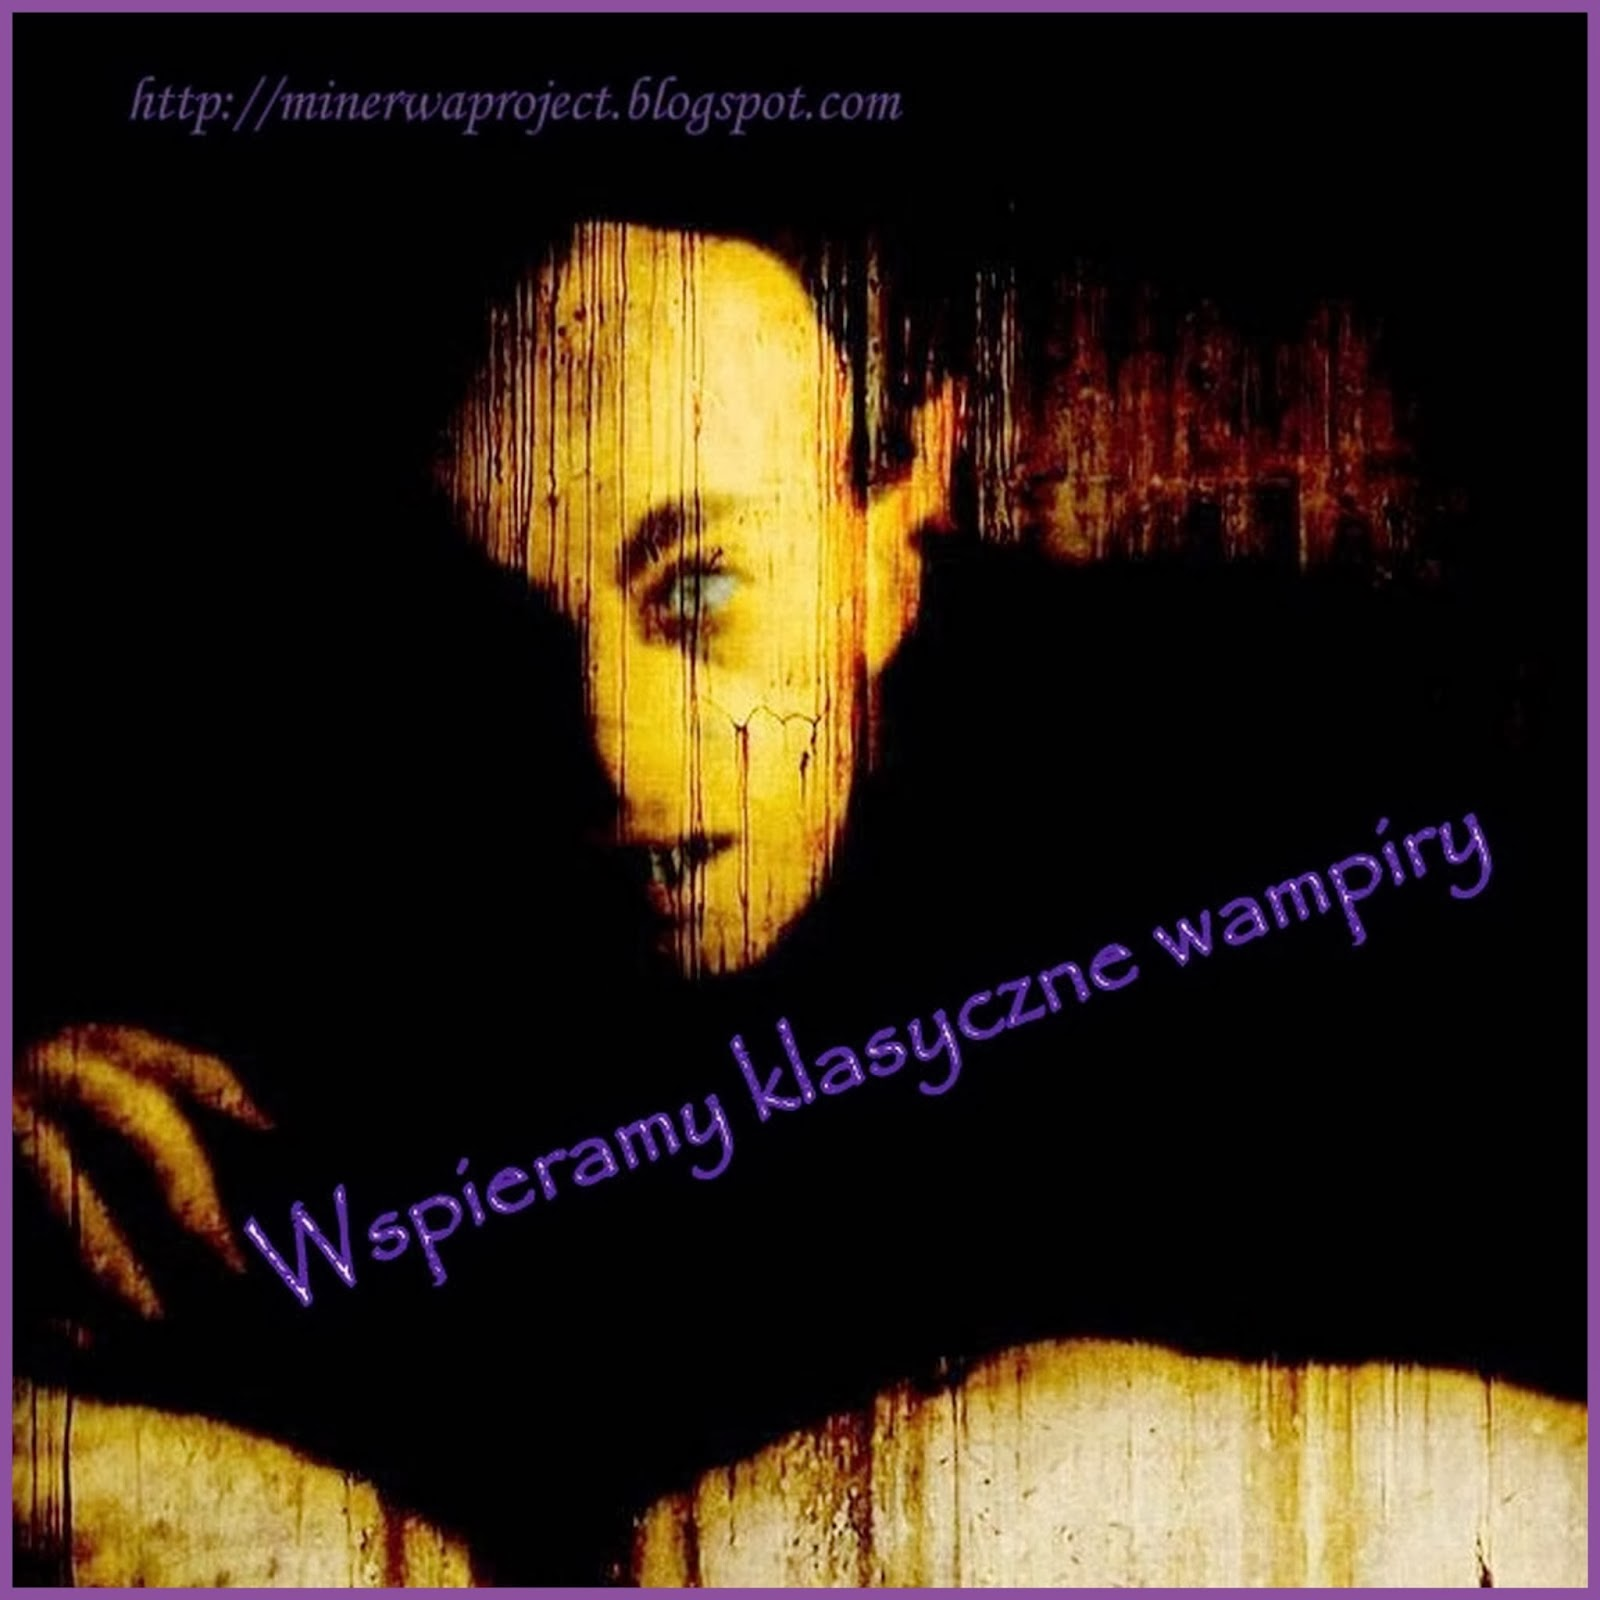 http://minerwaproject.blogspot.com/p/wampiry.html